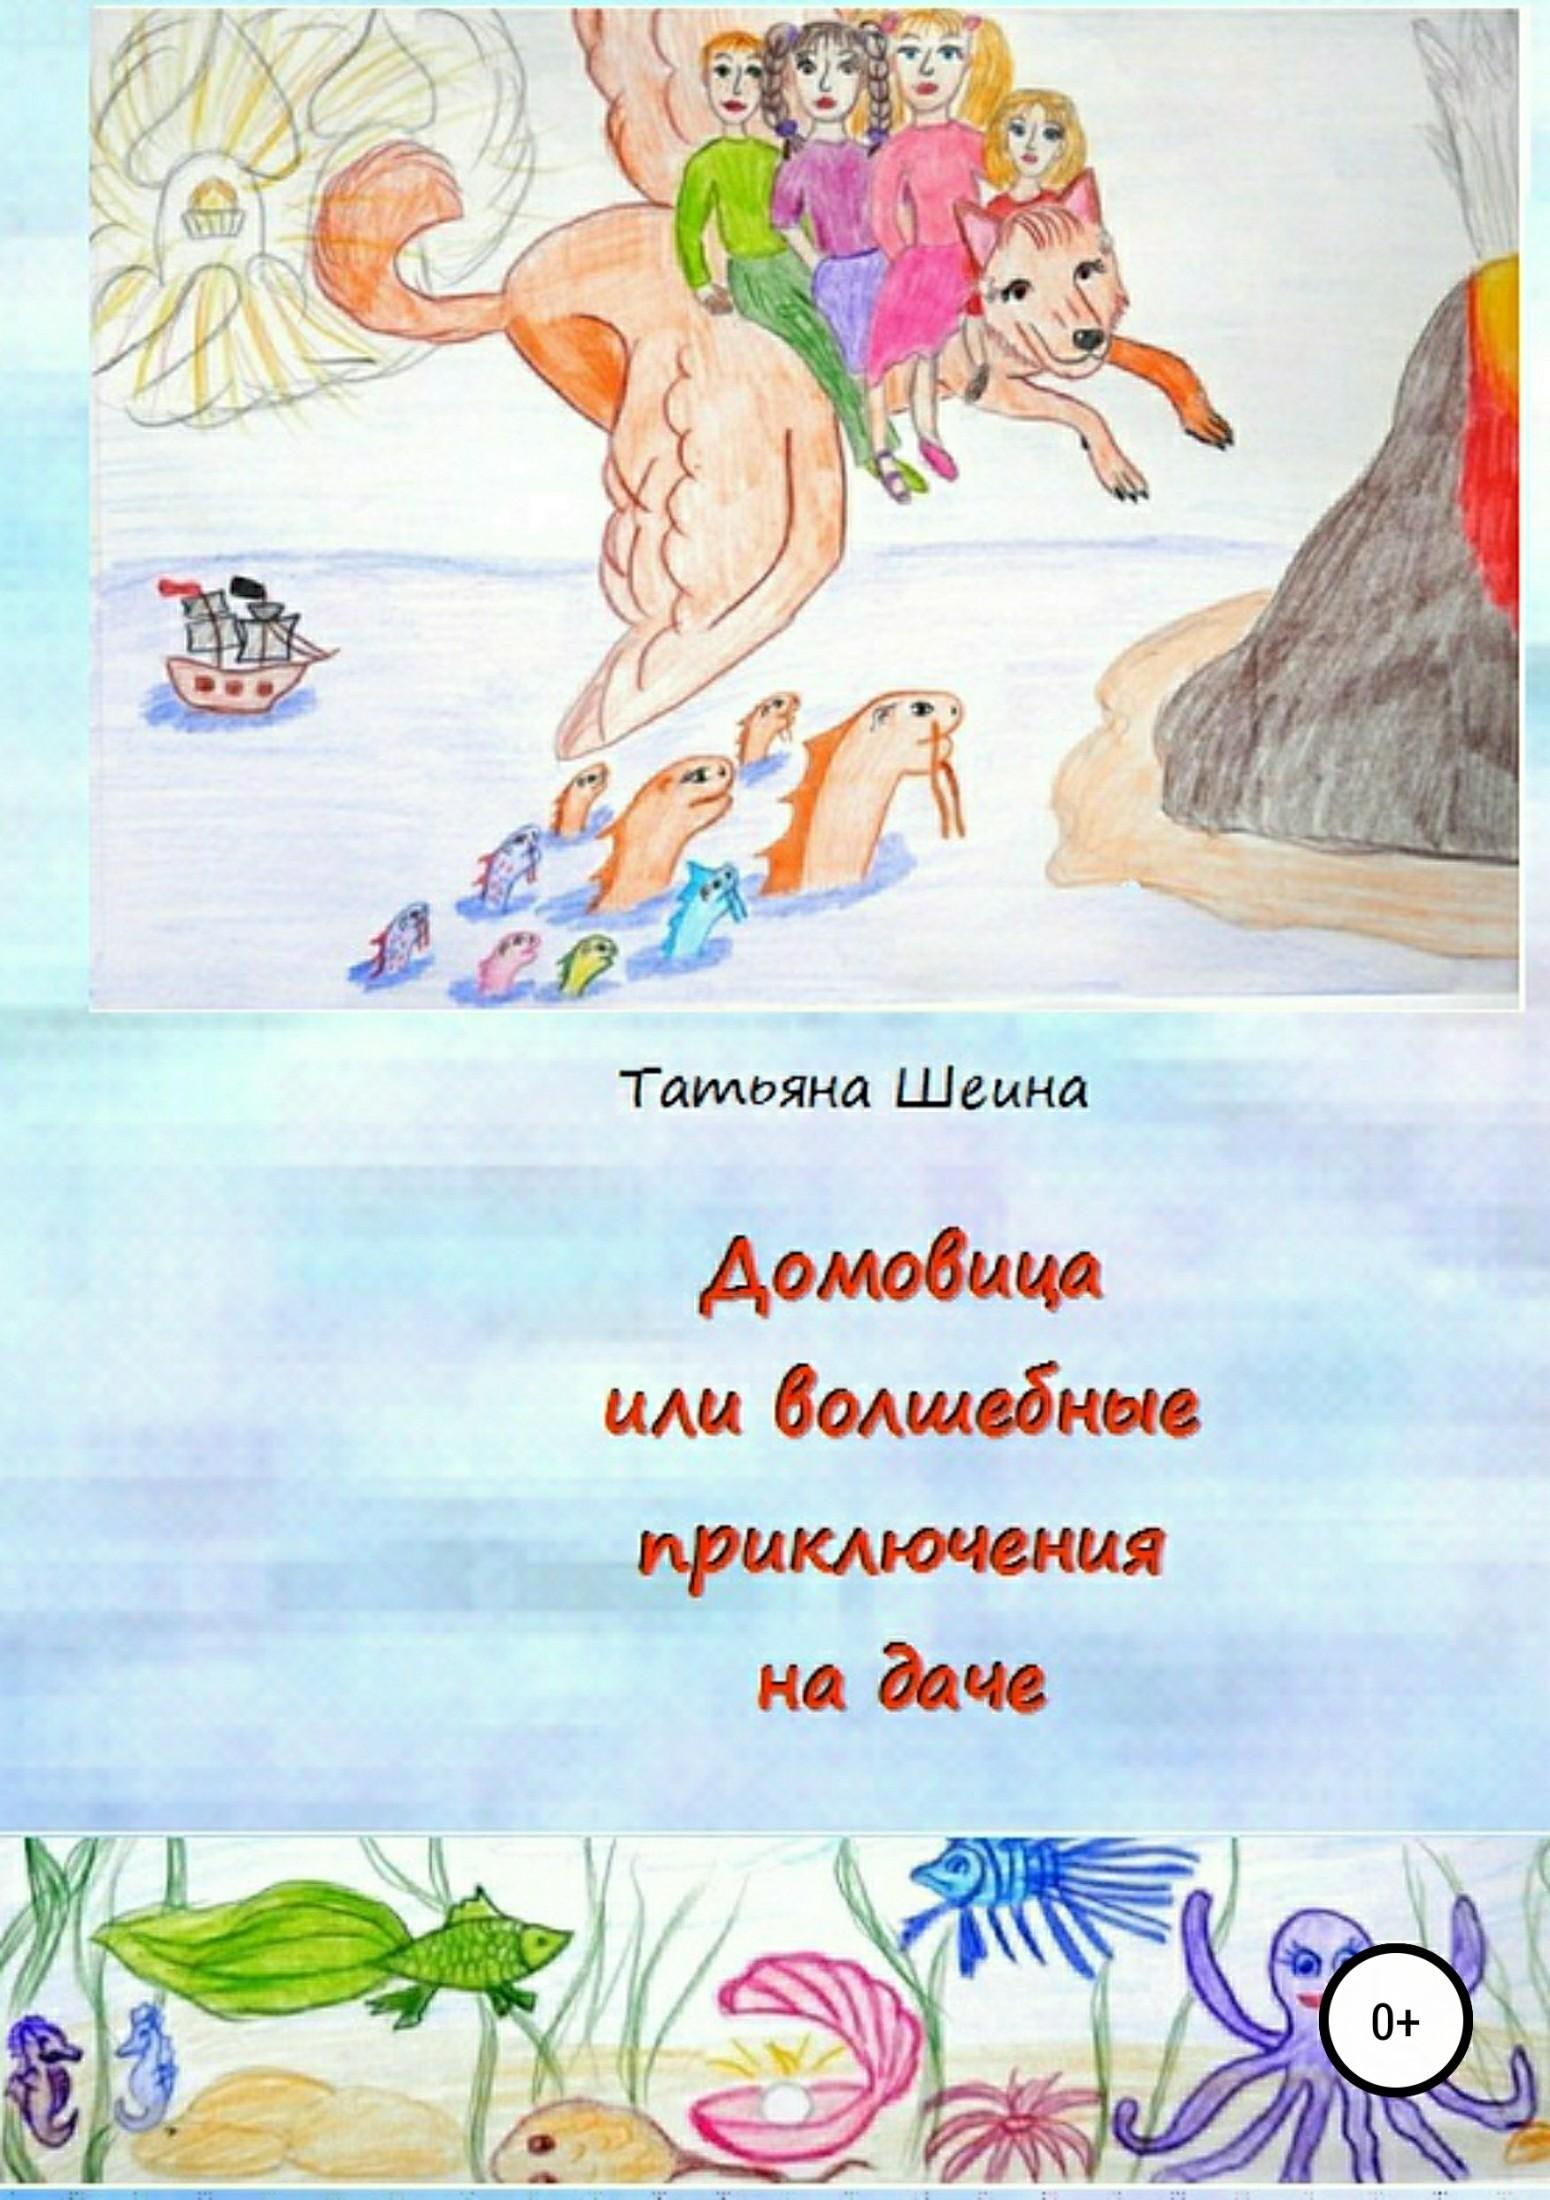 Татьяна Евгеньевна Шеина бесплатно